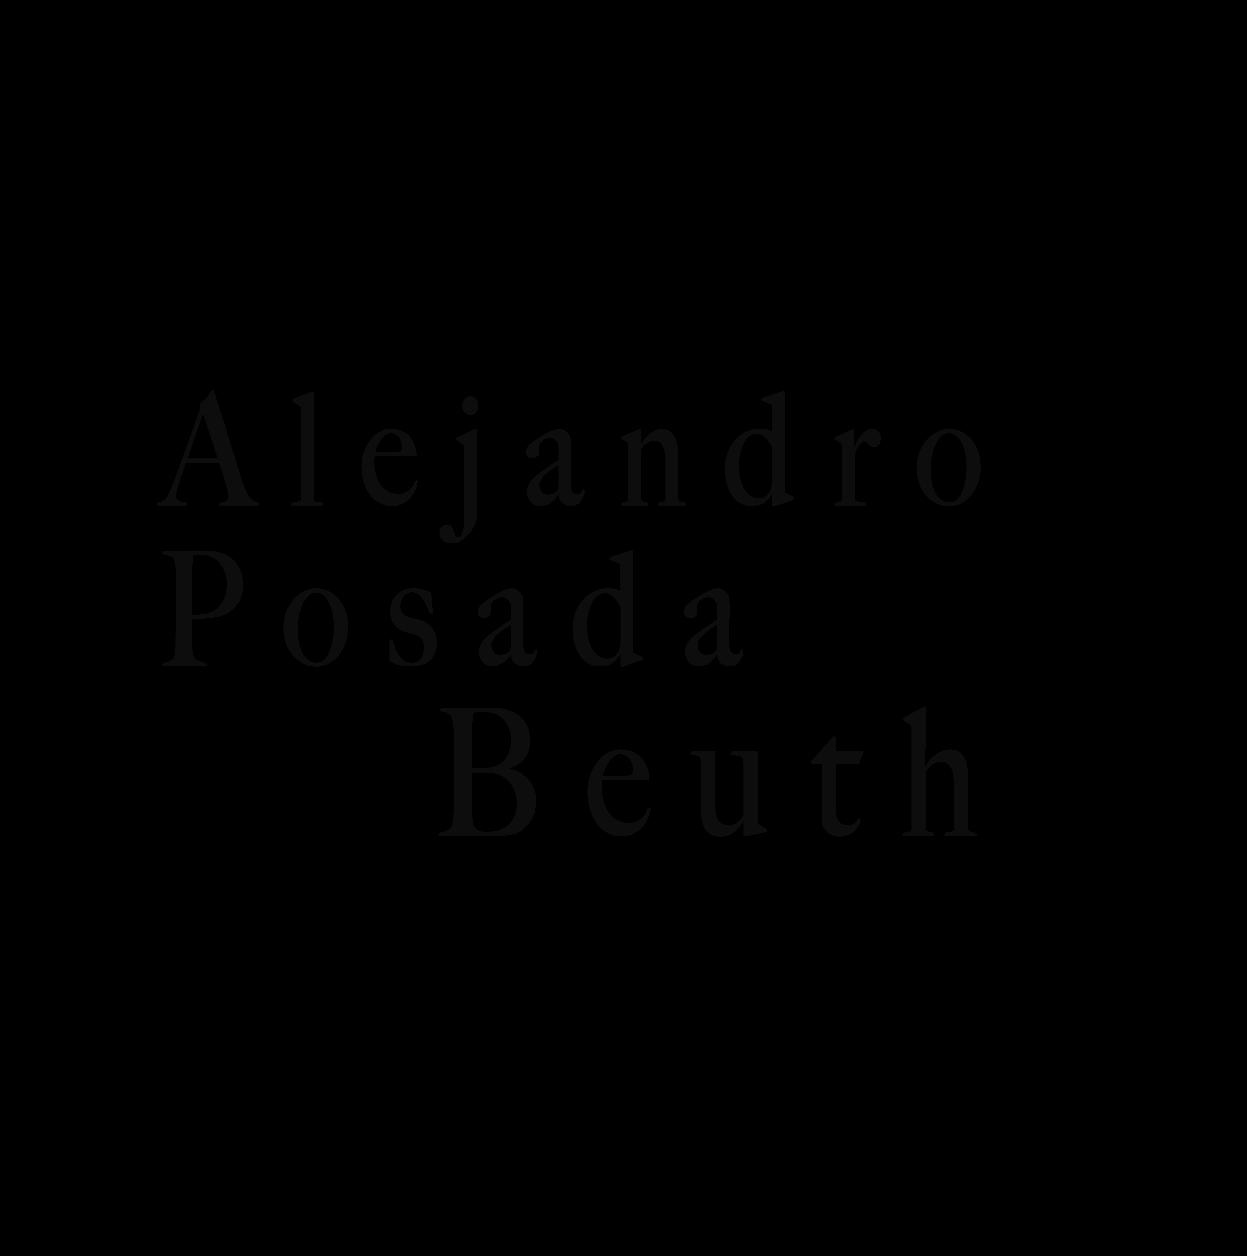 Dr. Alejandro Posada Beuth Medicina Sintergética